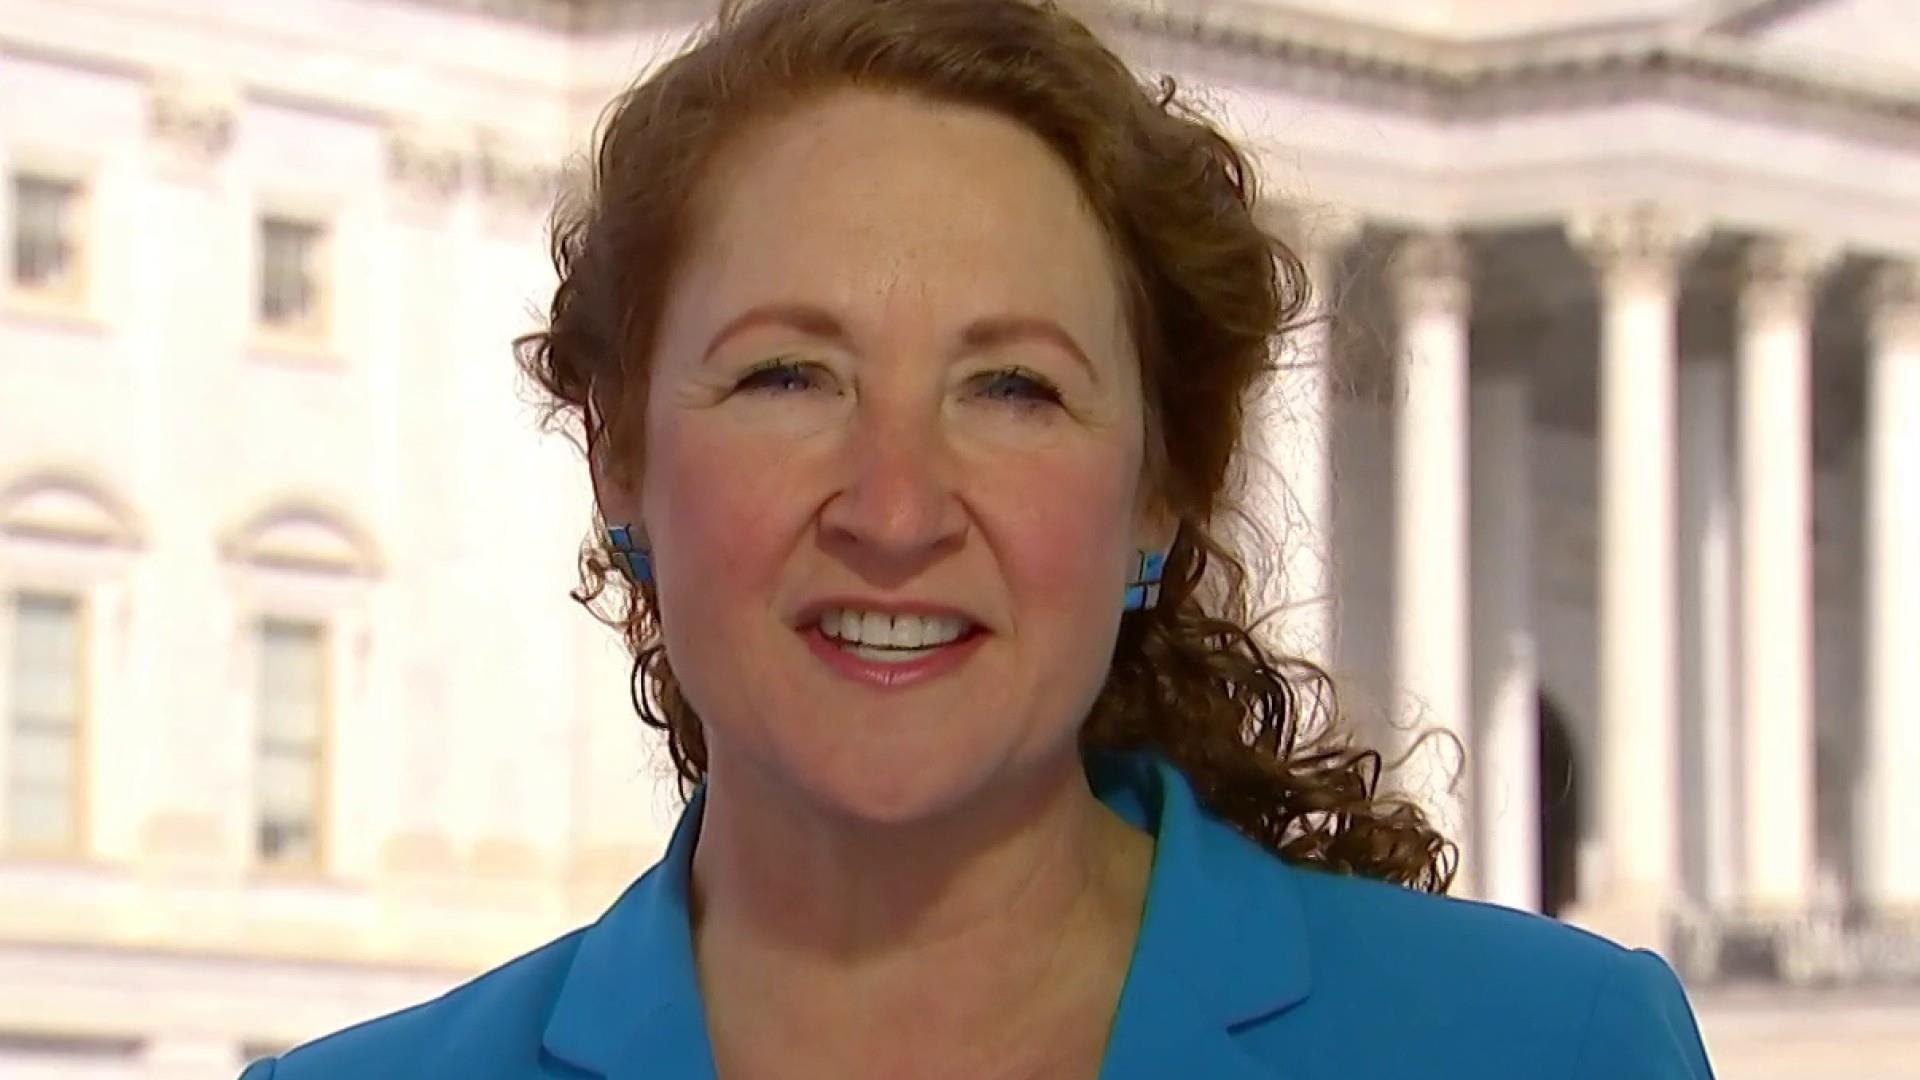 Sandy Hook Congresswoman: 'Gun owners are parents too'